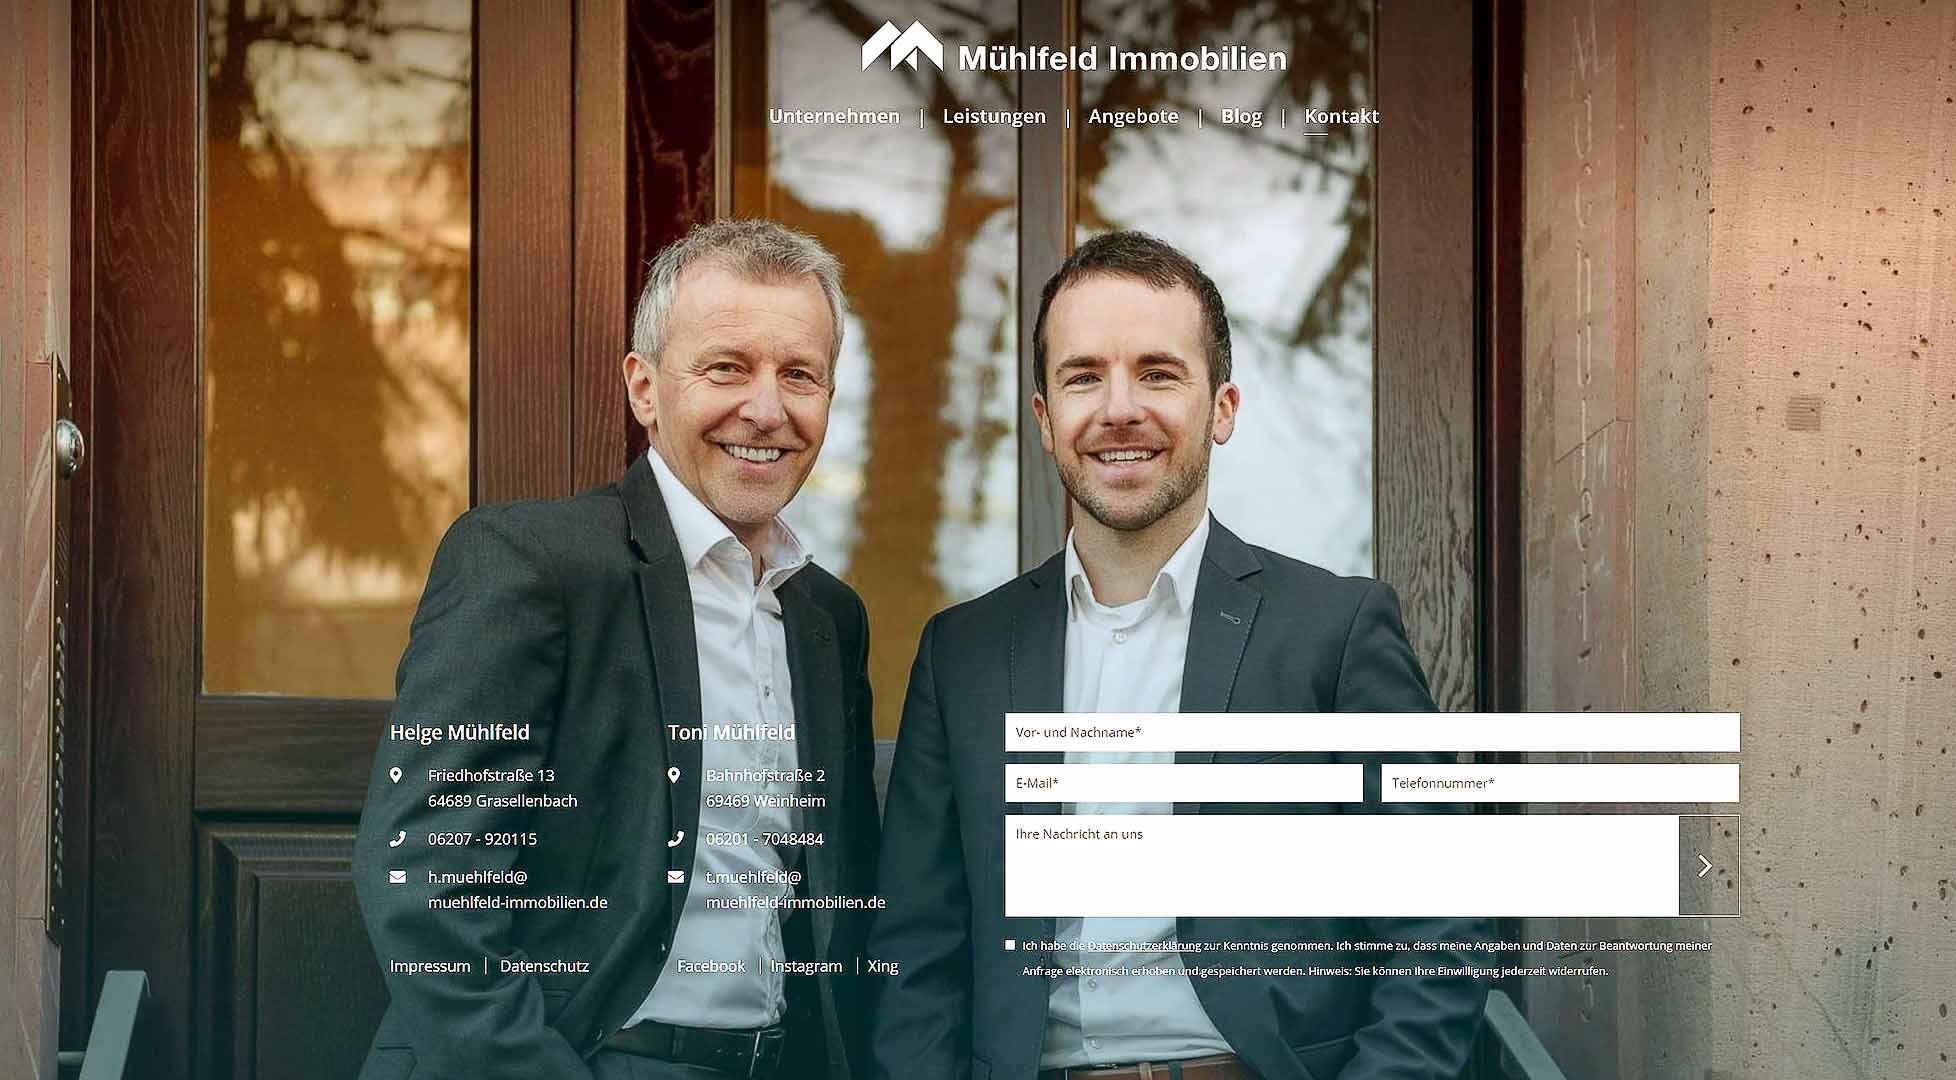 fotograf-businessfotos-firmenfotos-weinheim-mannheim-heidelberg